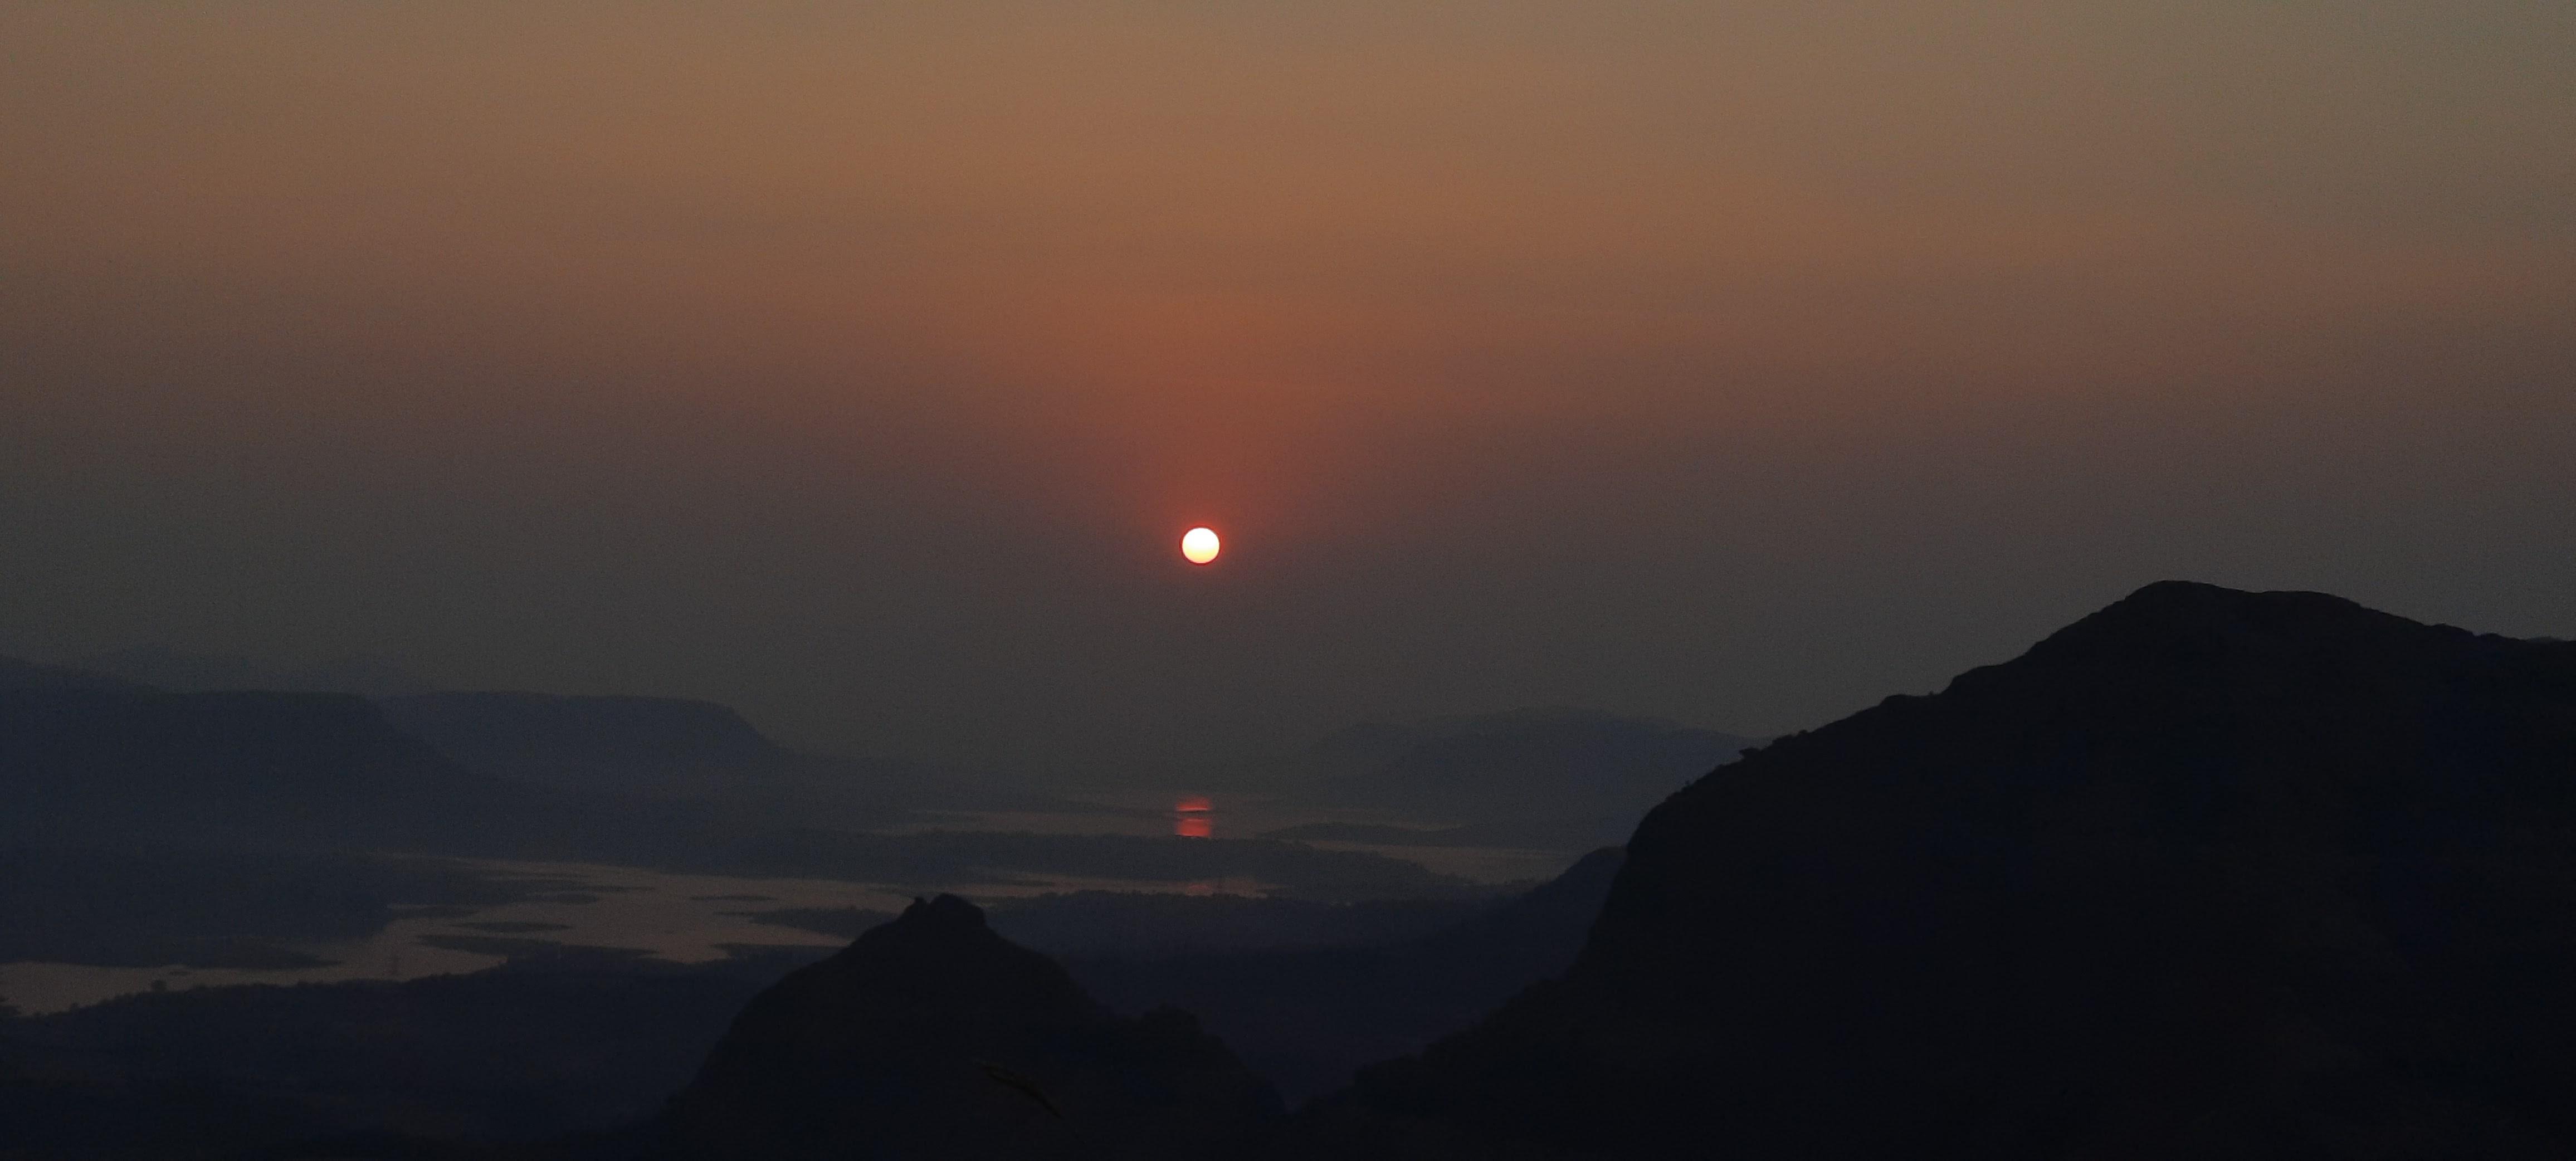 Sunrise seen from Jivdhan - जीवधन वरून सूर्योदय